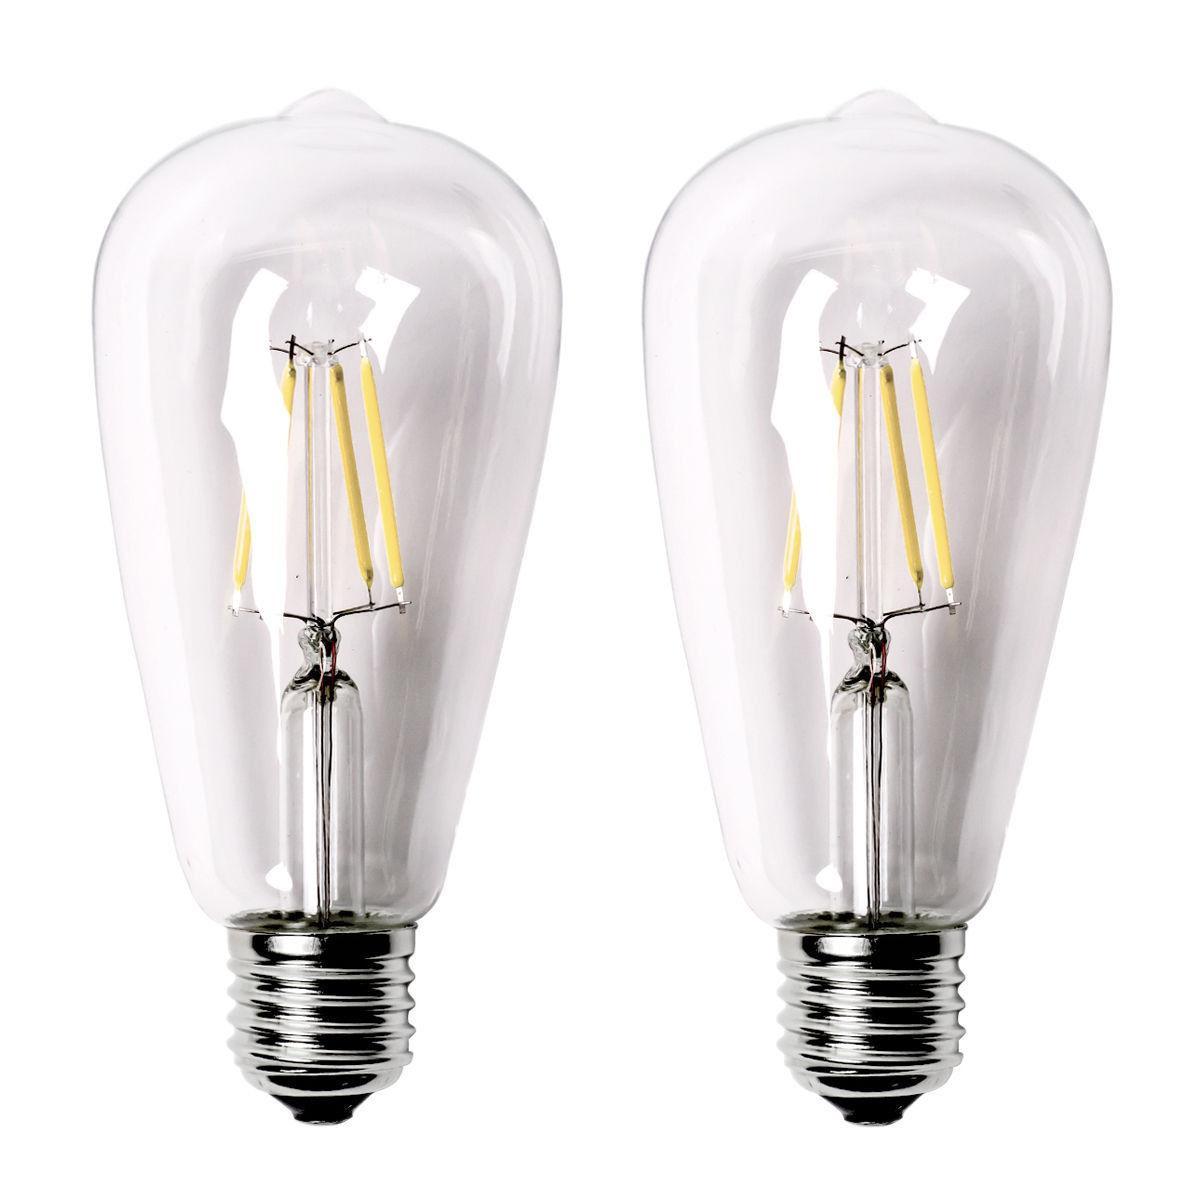 E27 6W Screw Light Lamp